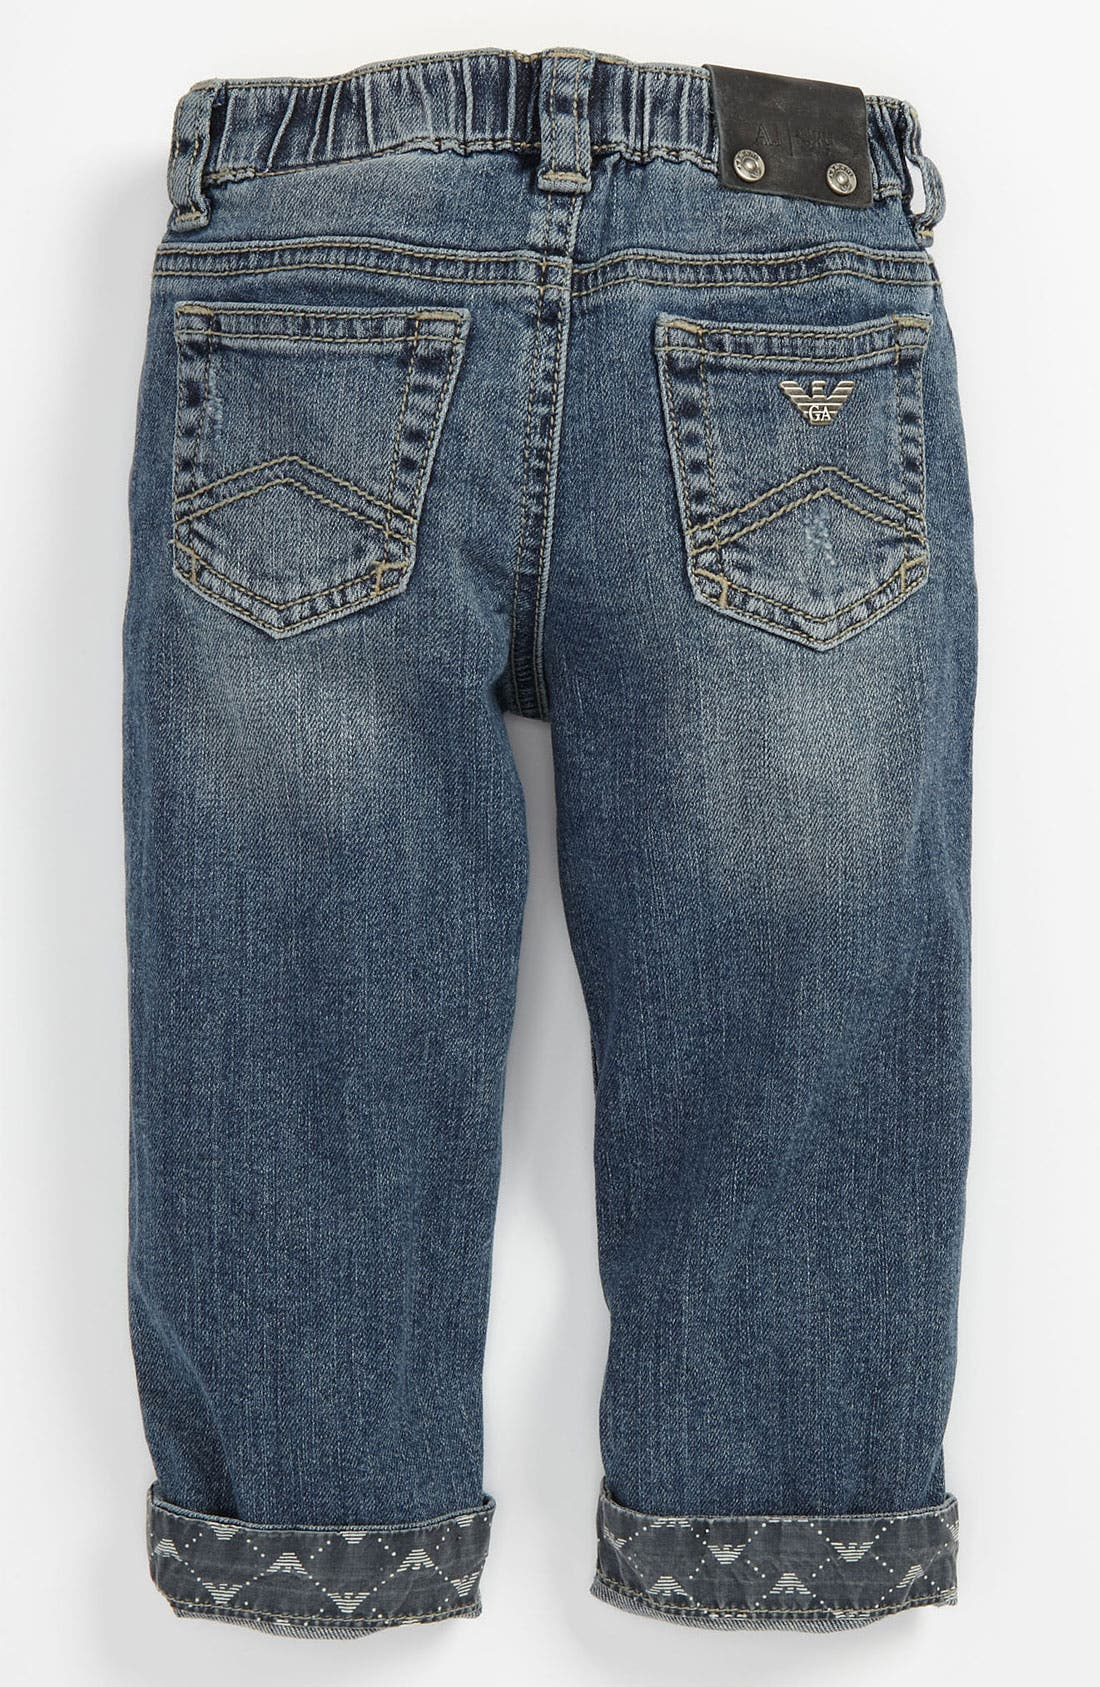 Main Image - Armani Junior Jeans (Baby)